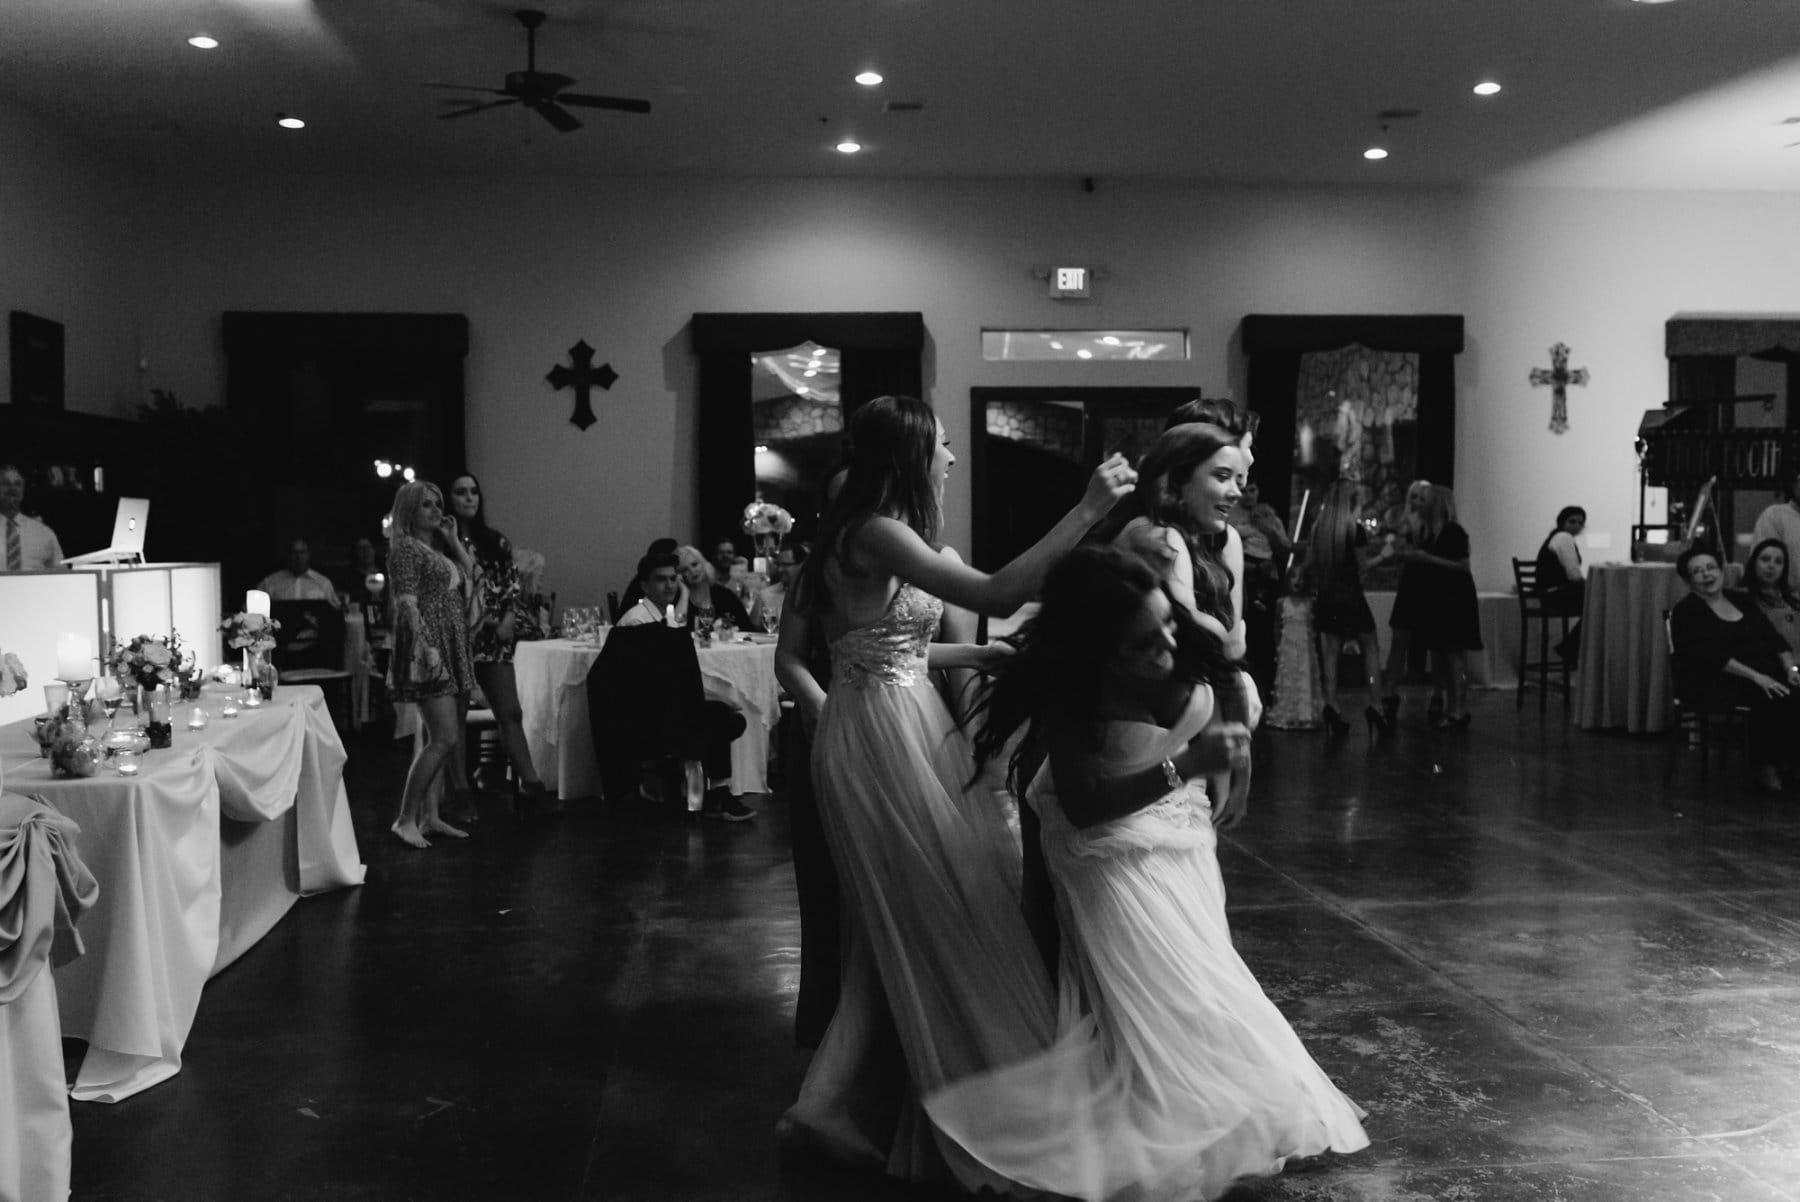 bouquet toss Superstition Manor wedding reception